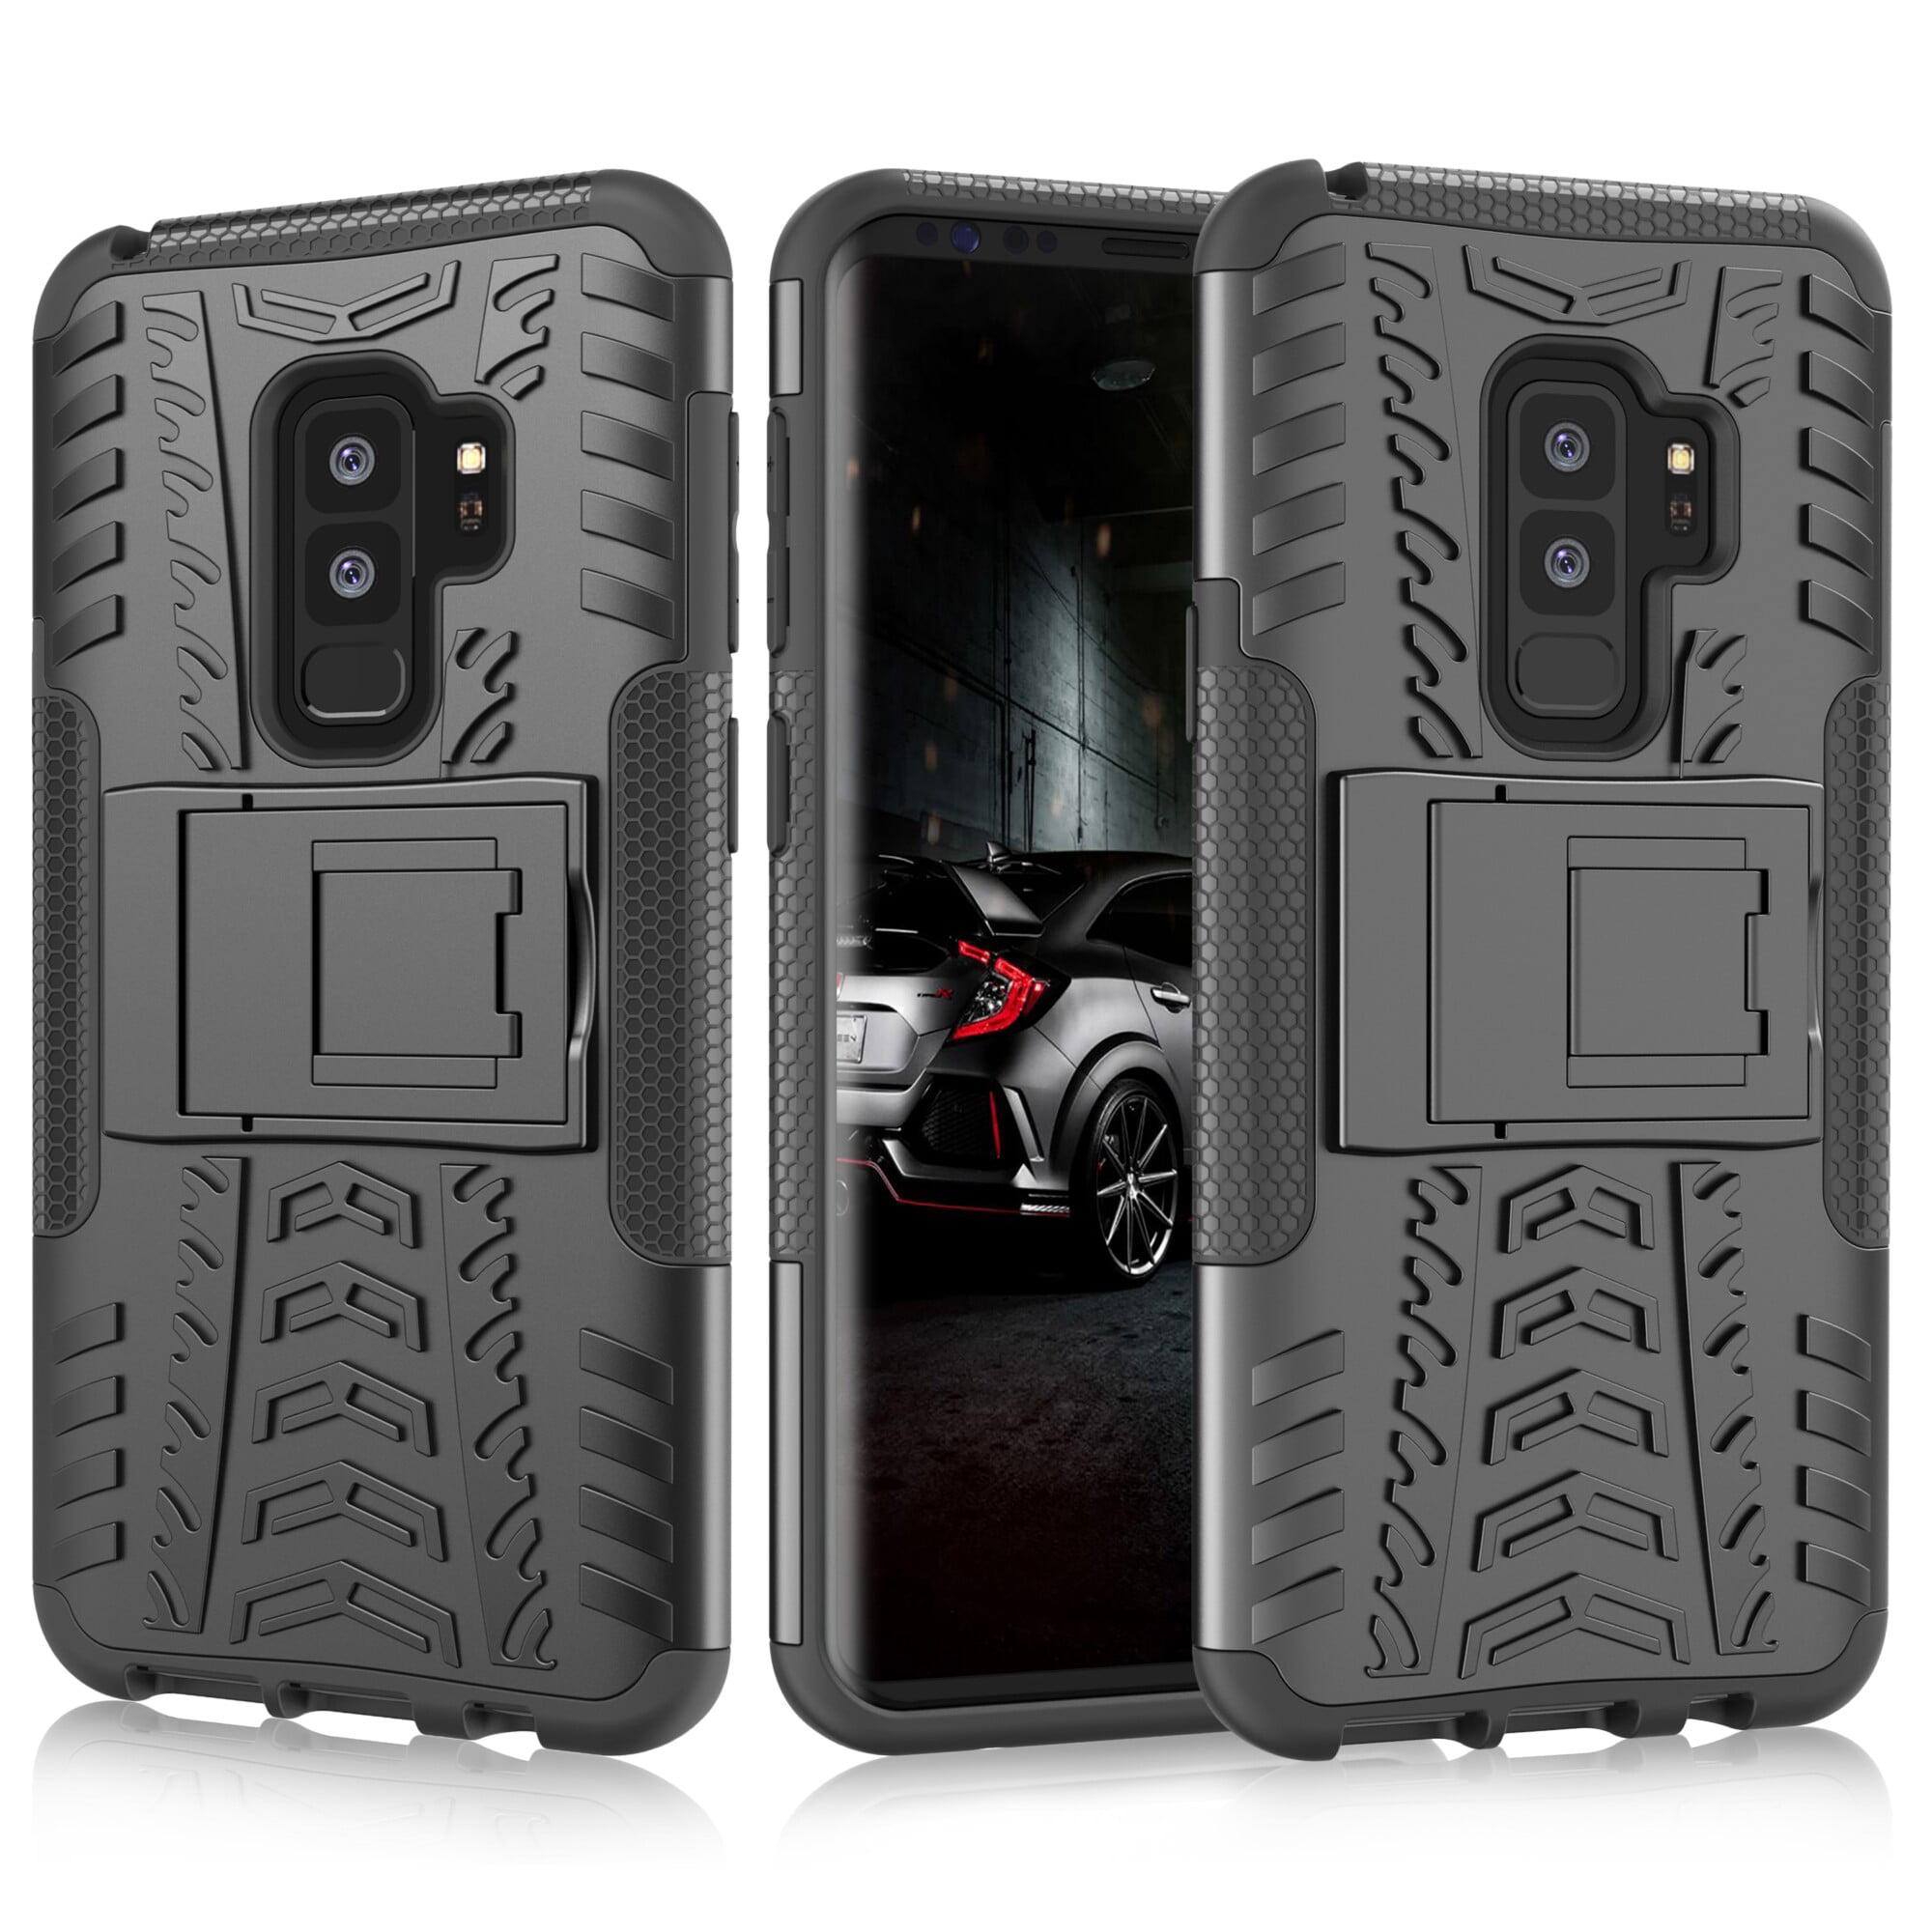 Galaxy S9 Plus Case, Samsung S9 Plus Kickstand, Galaxy S9+ Cover, Njjex [Built-in Kickstand][Non-slip Design] Hybrid Full-body Rugged [Shock Proof] Protection Cover For Samsung Galaxy S9 Plus -Black